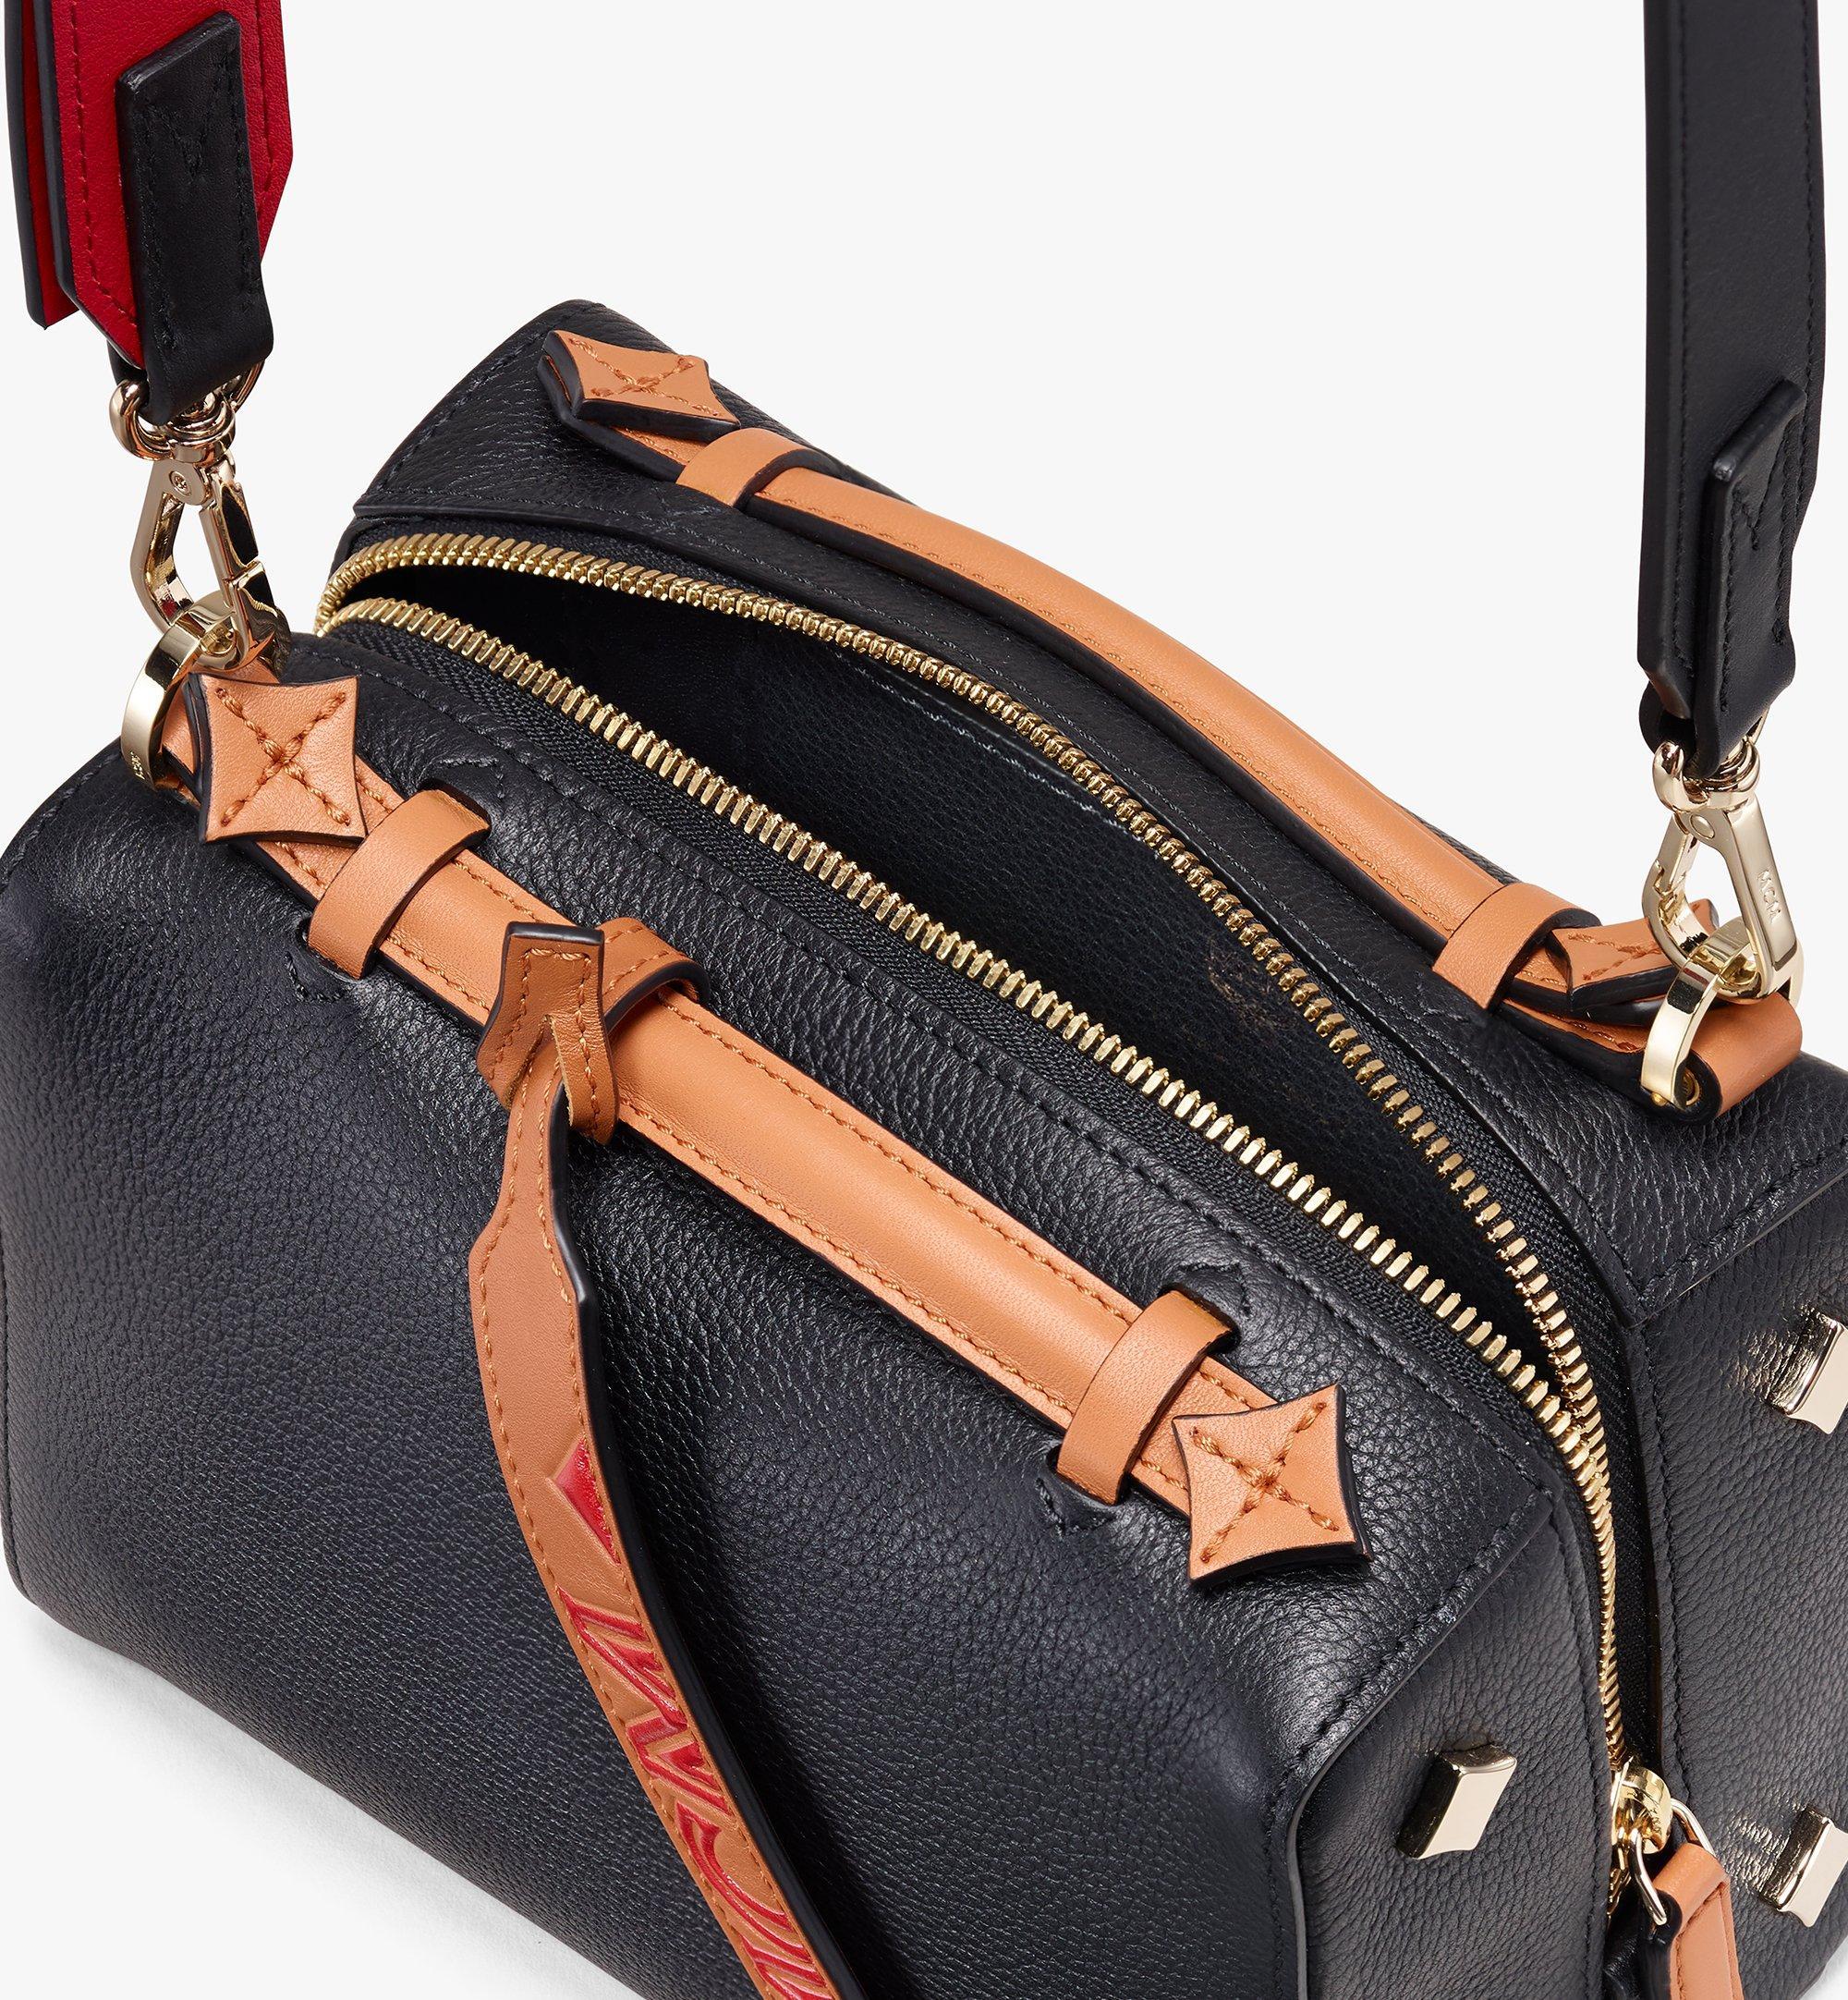 MCM Milano Boston Bag in Calfskin Leather Black MWB9ADA52BK001 Alternate View 4